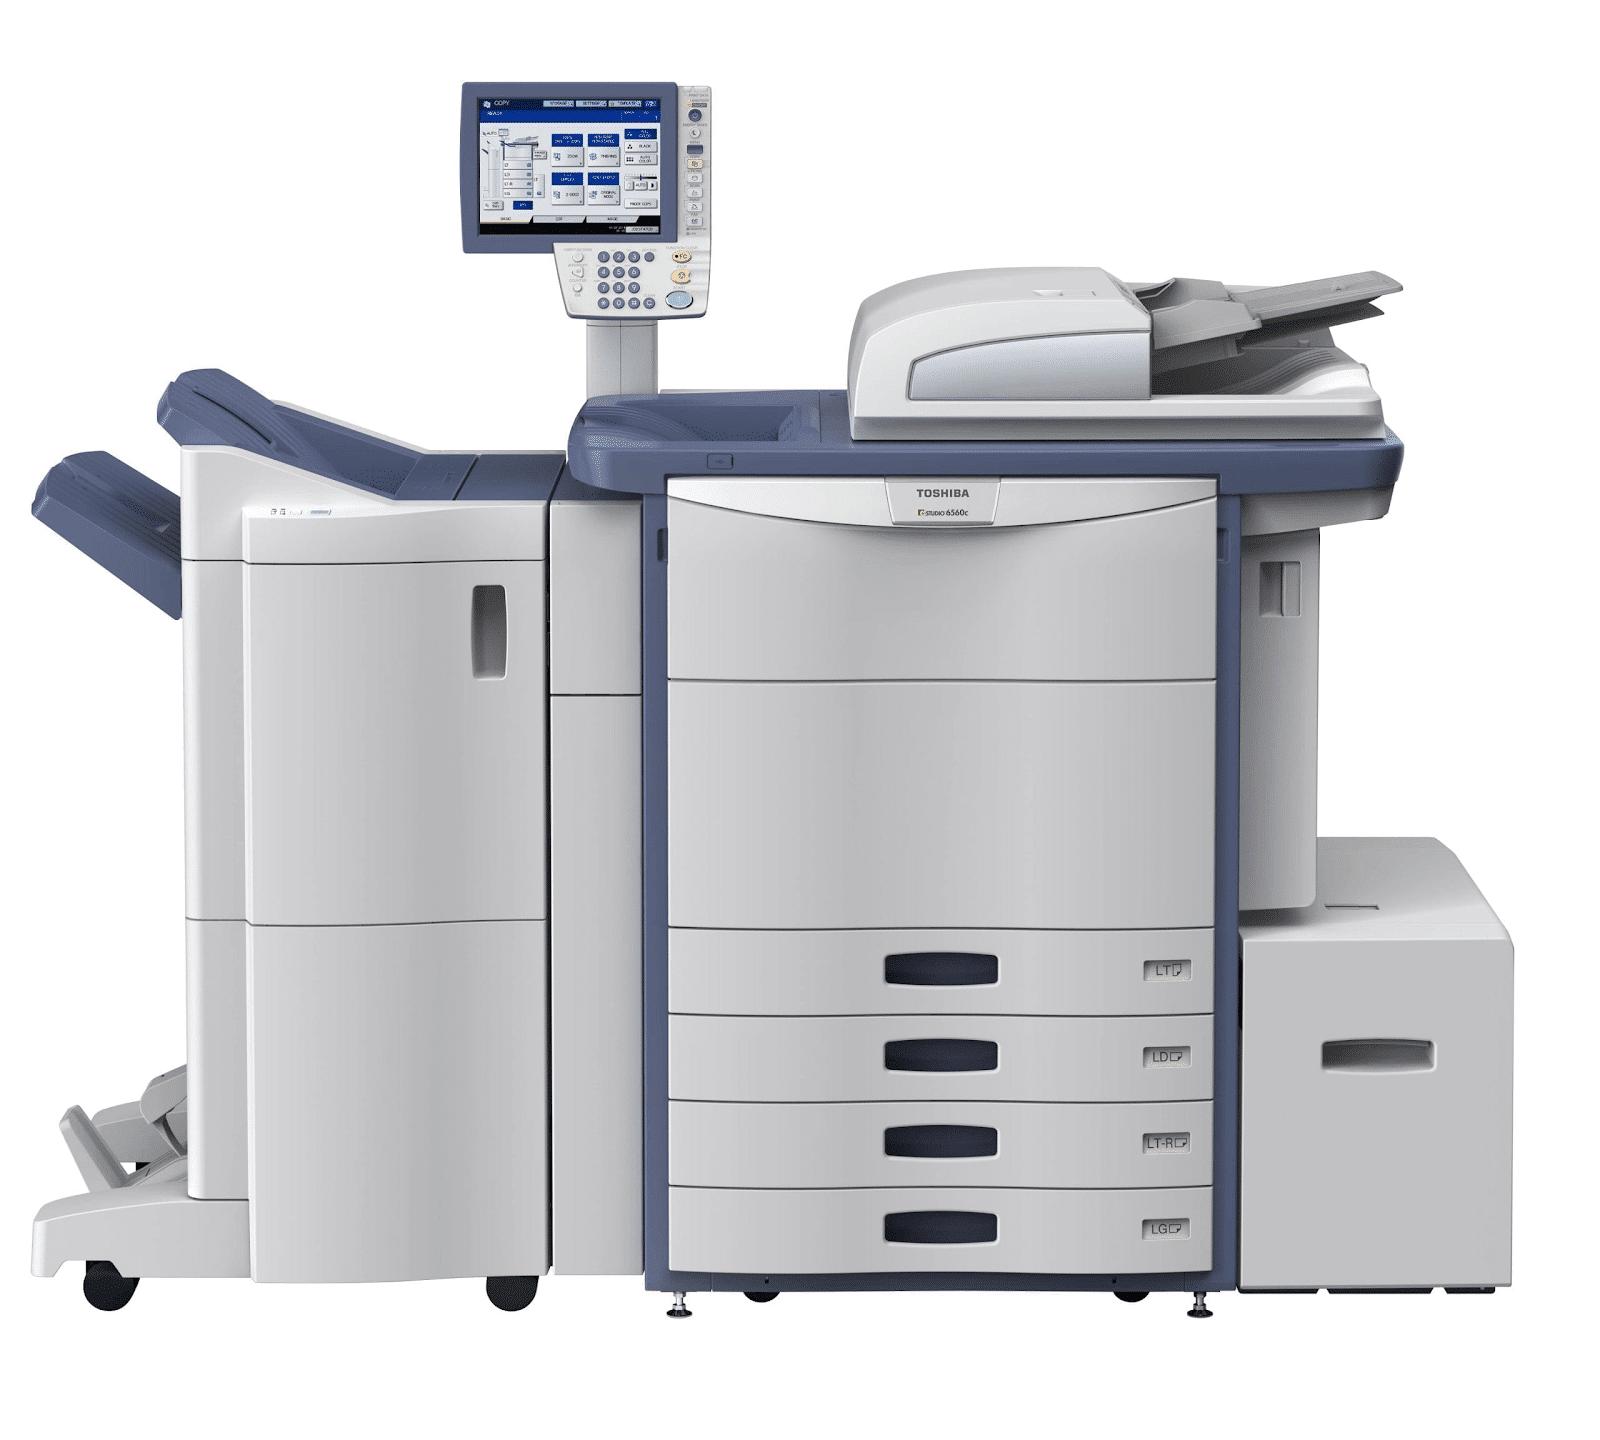 Máy photocopy công ty Đa Phú Quý